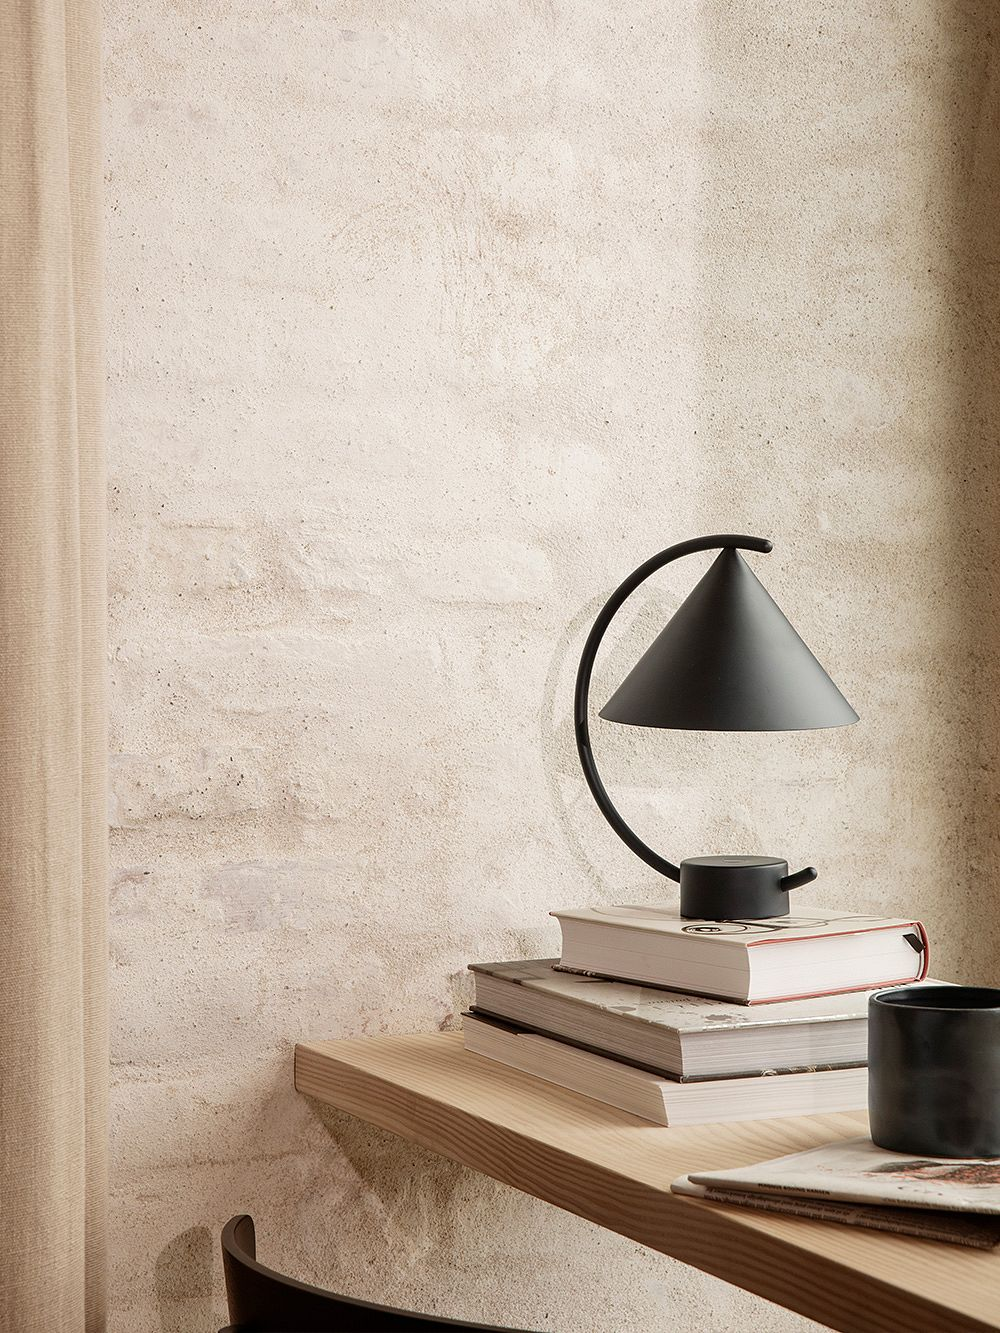 Ferm Living's Meridian table lamp